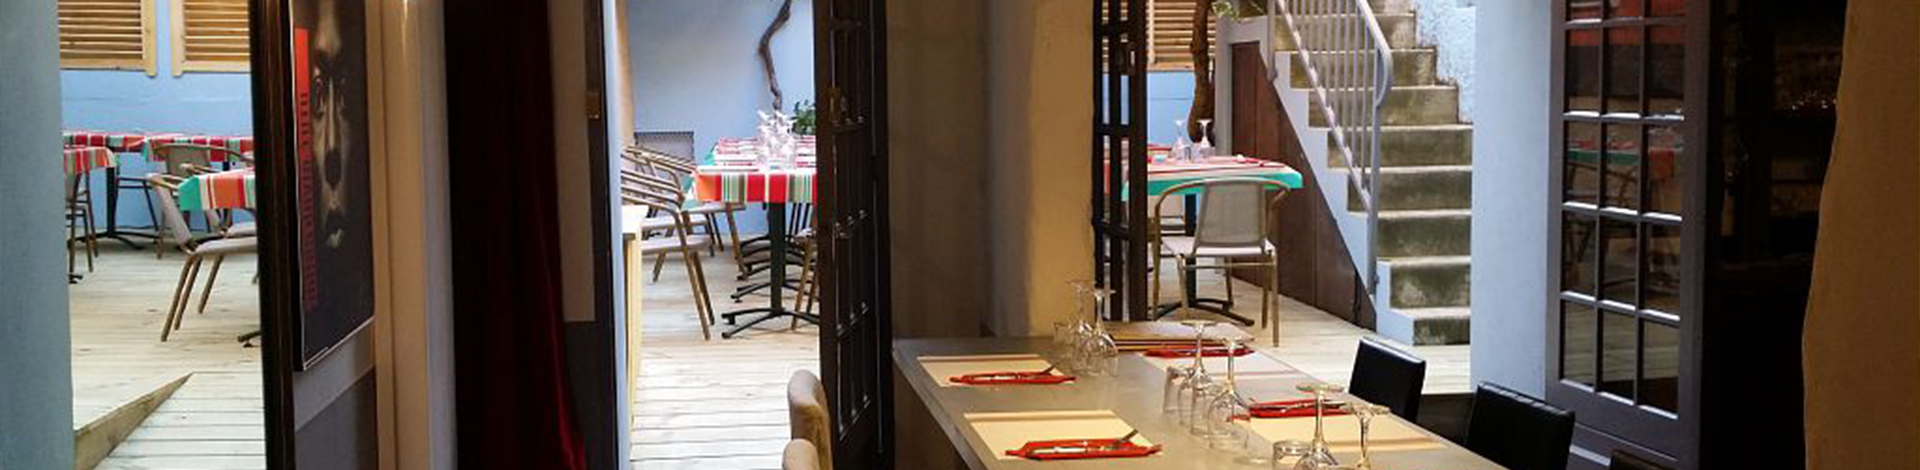 Marciac for Arriere cuisine marciac